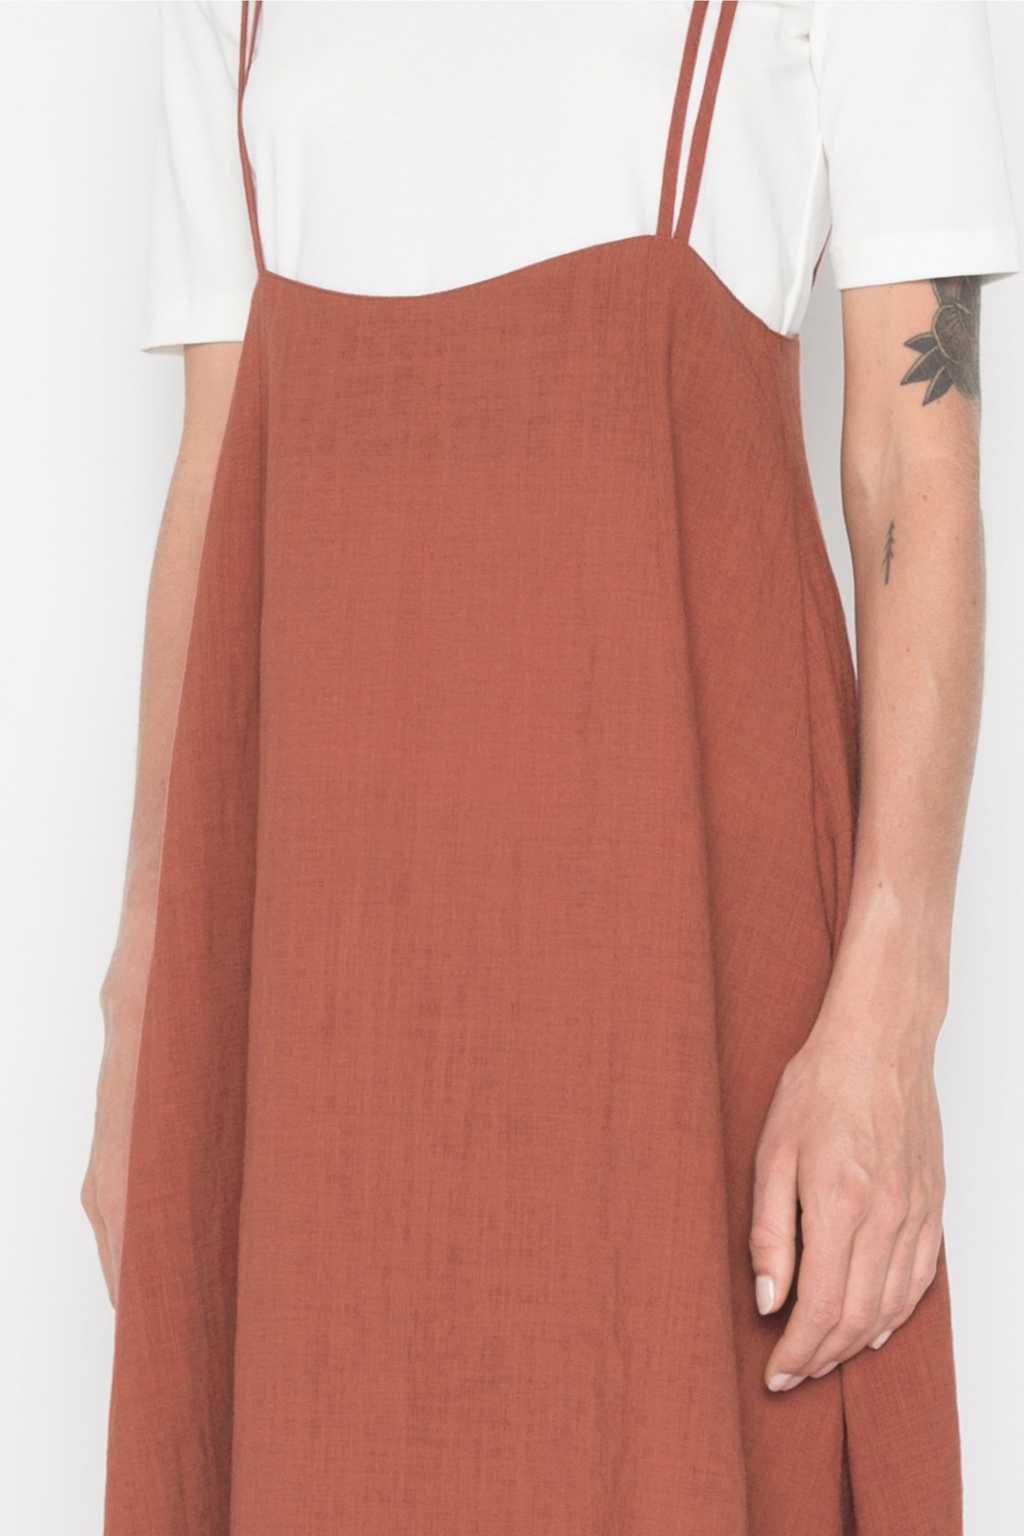 Dress H185 Brown 2